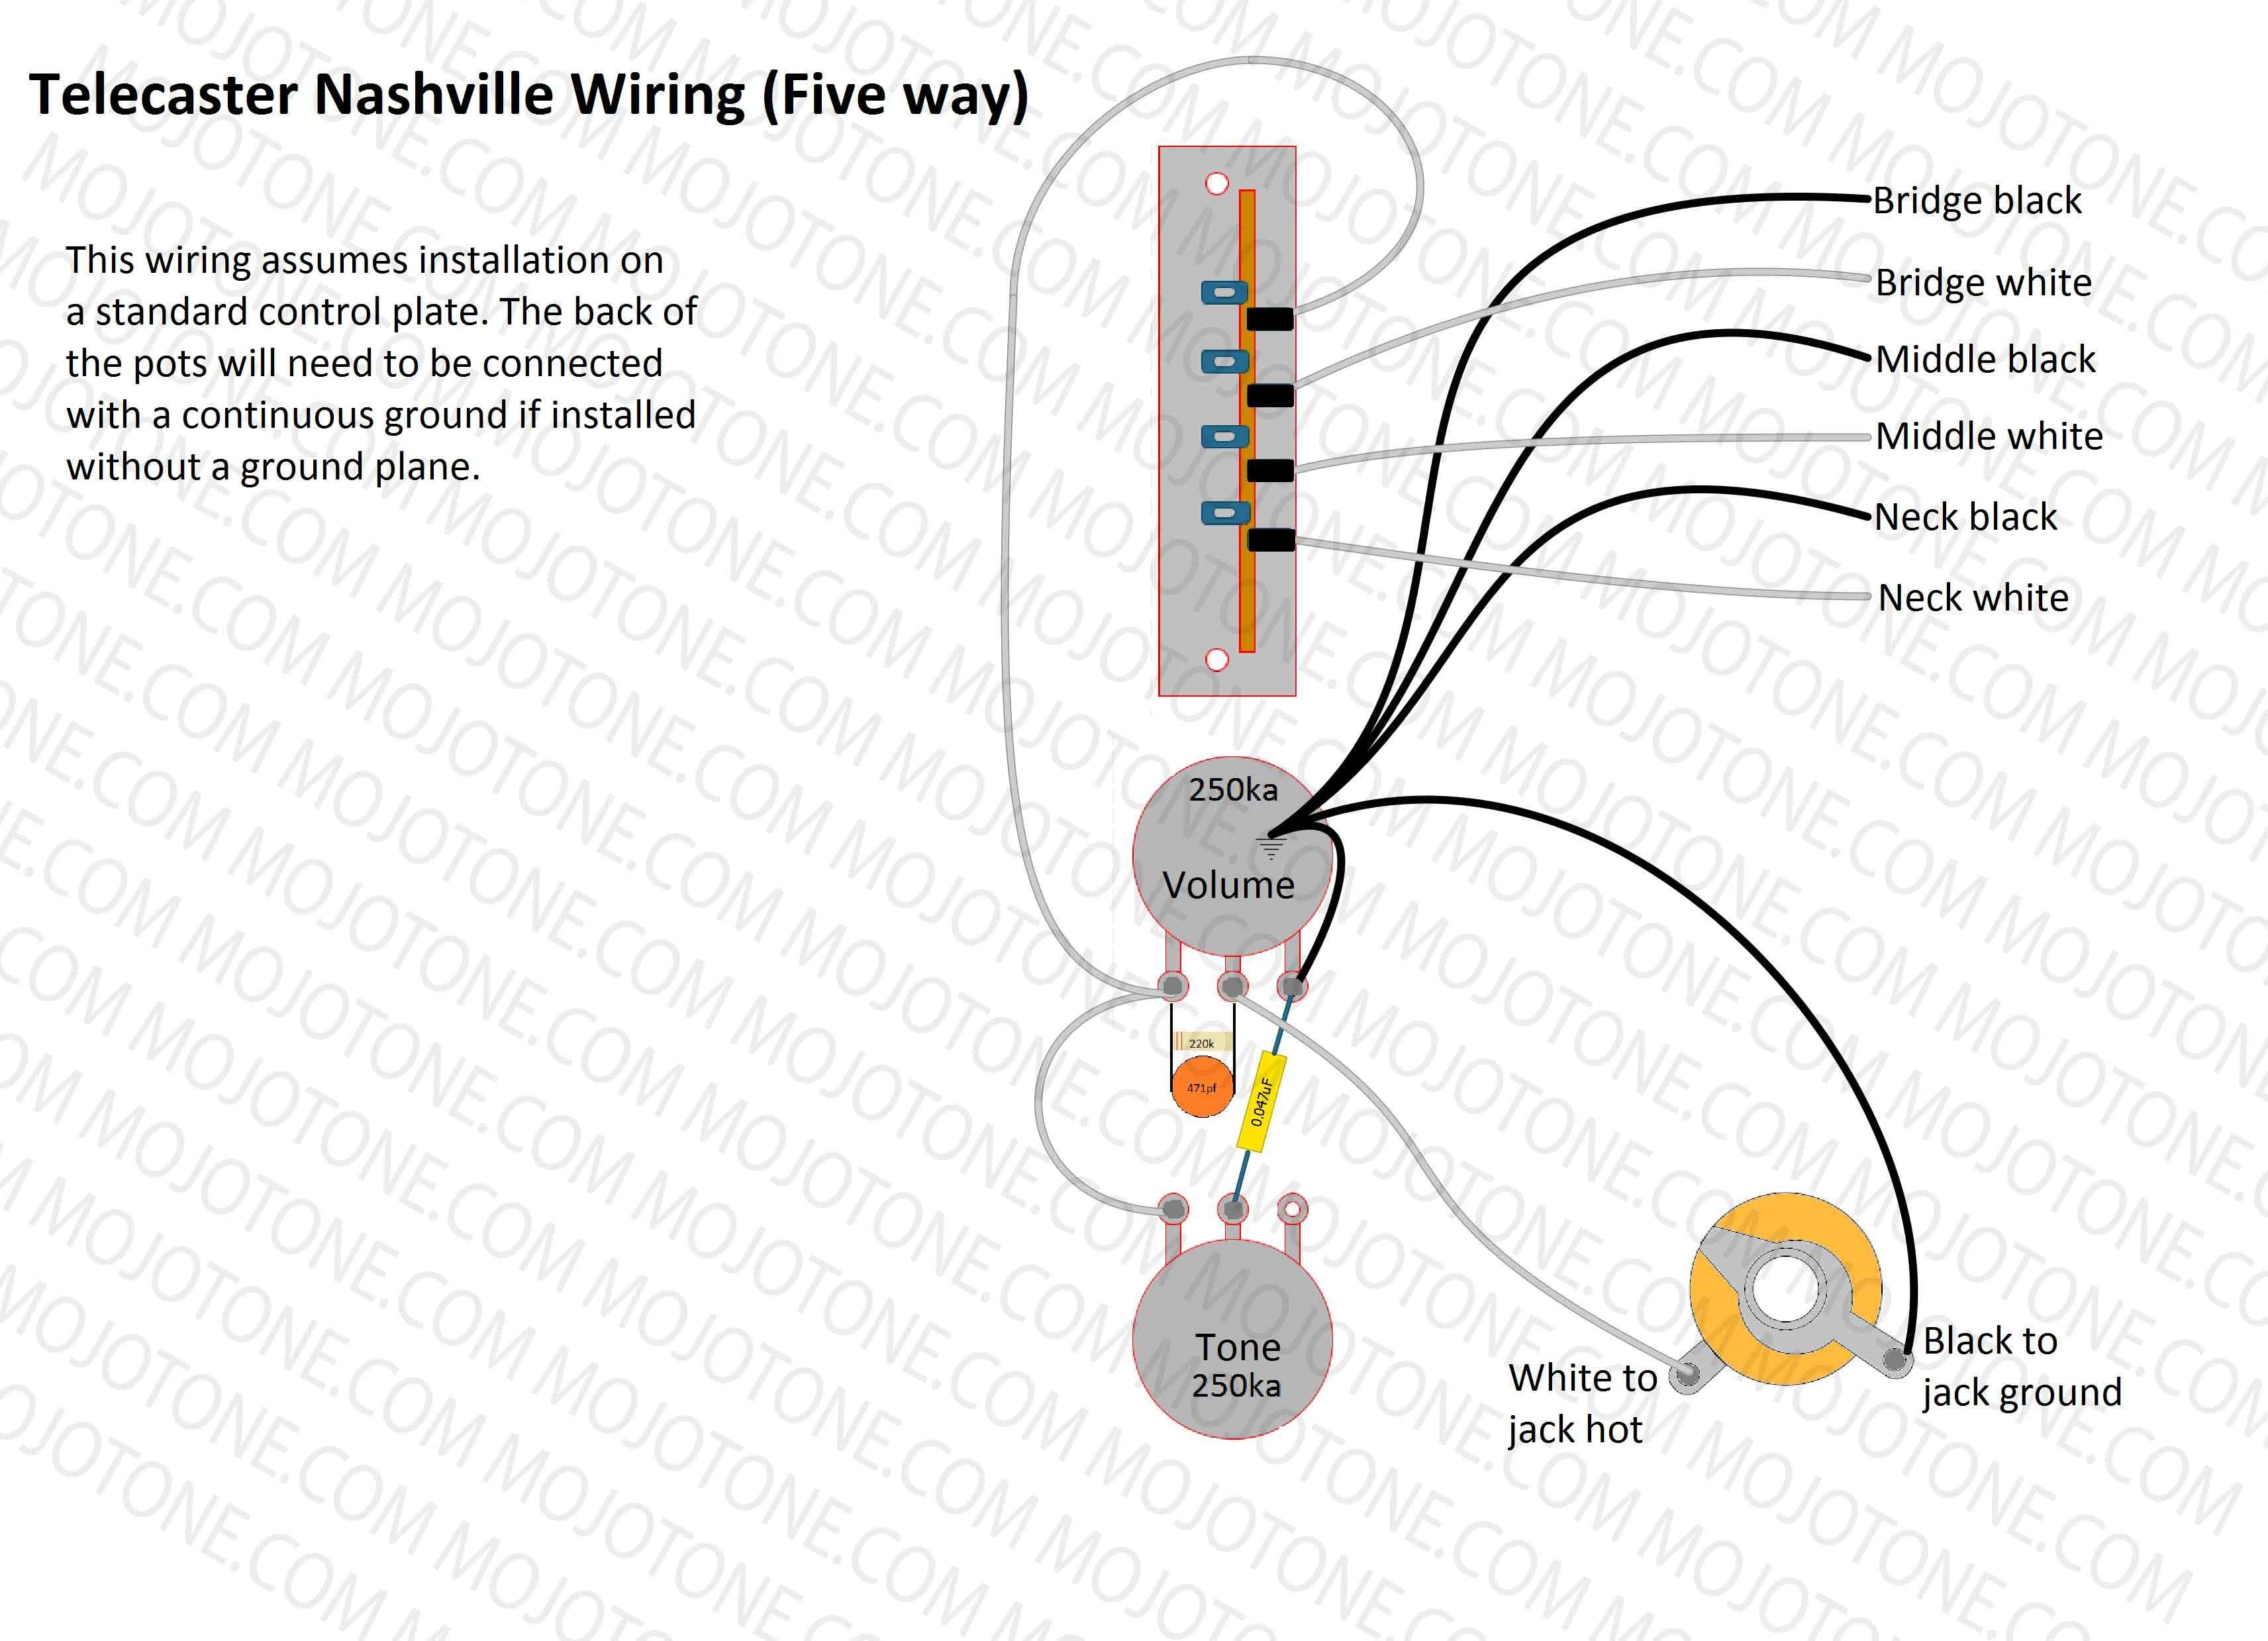 Telecaster Nashville Wiring Diagram | Telecasters in 2019